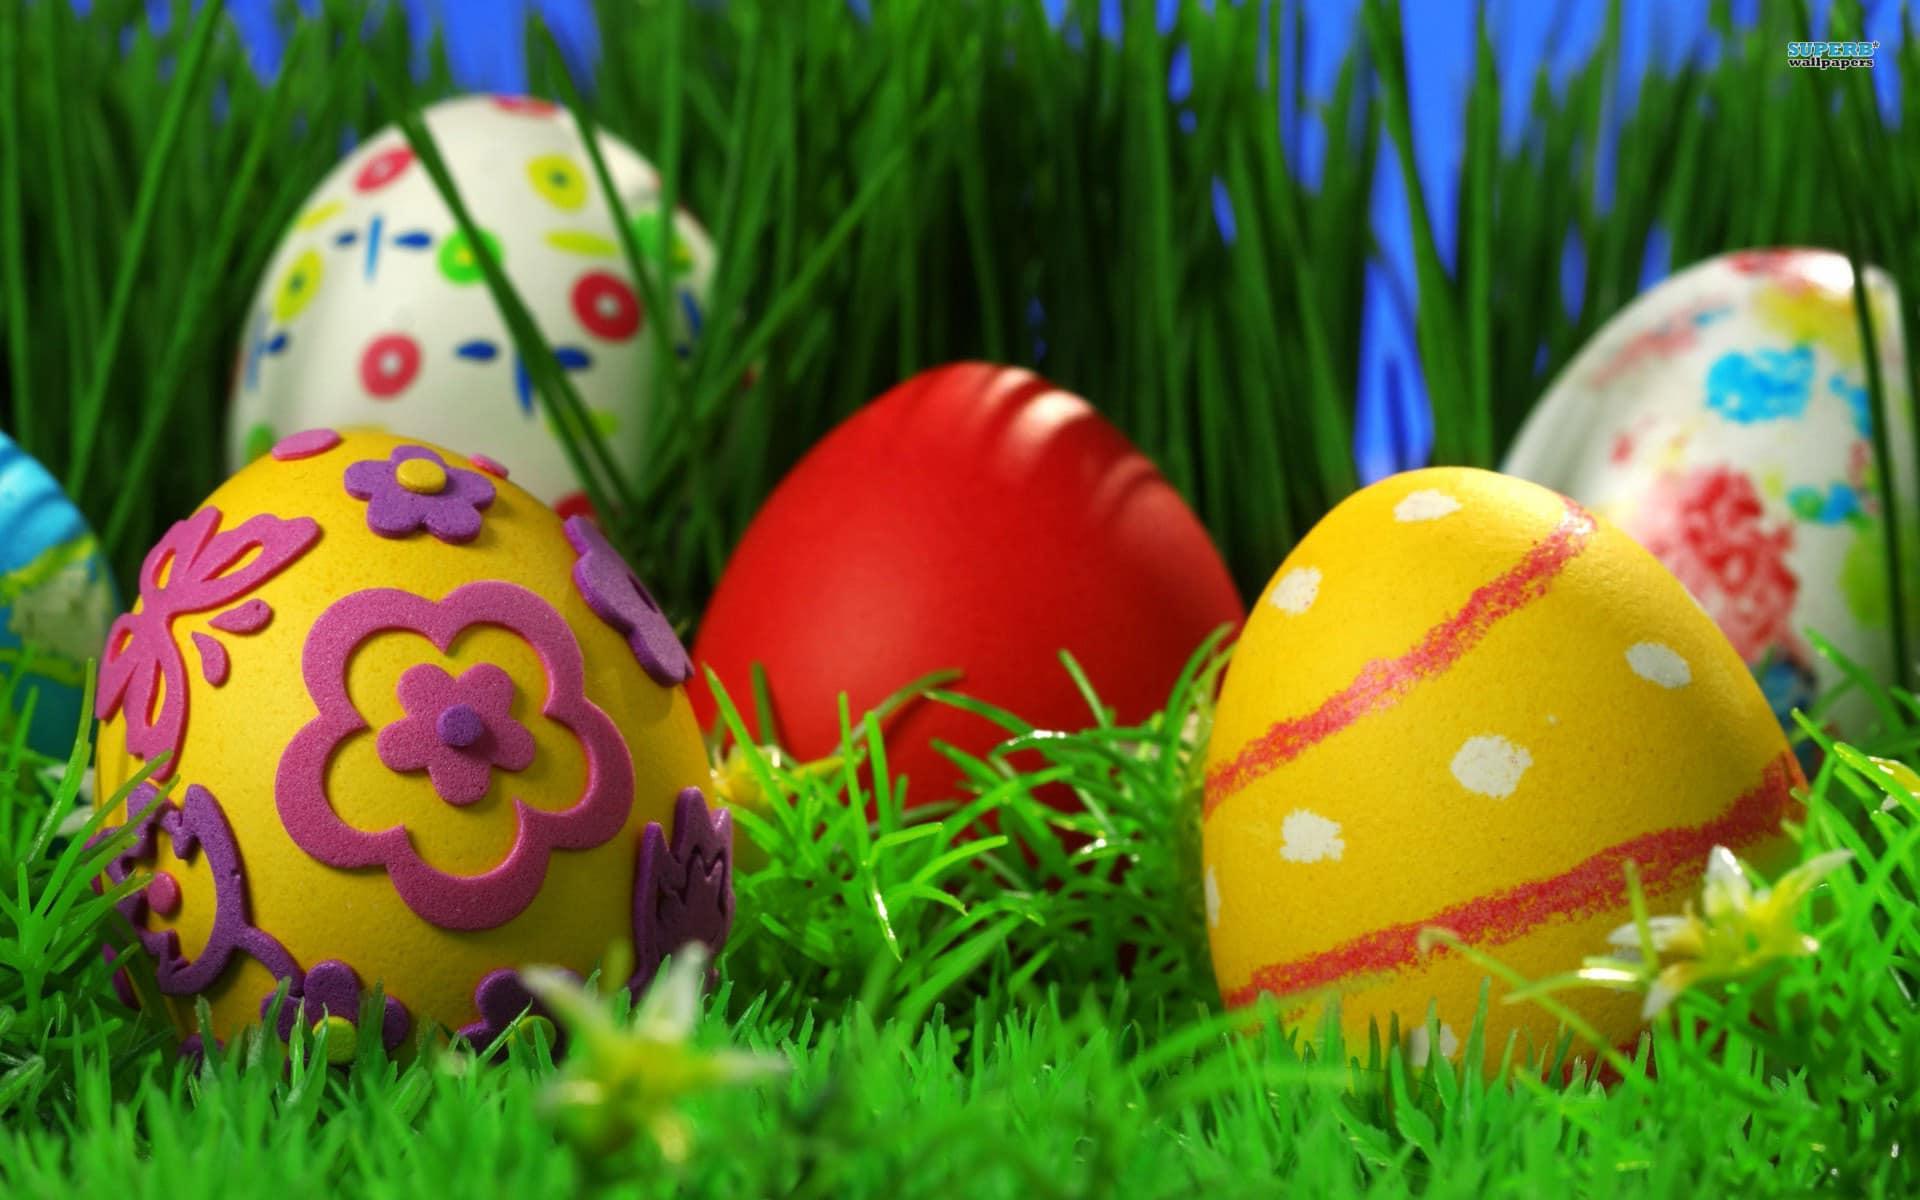 easter-eggs-11874-1920x1200